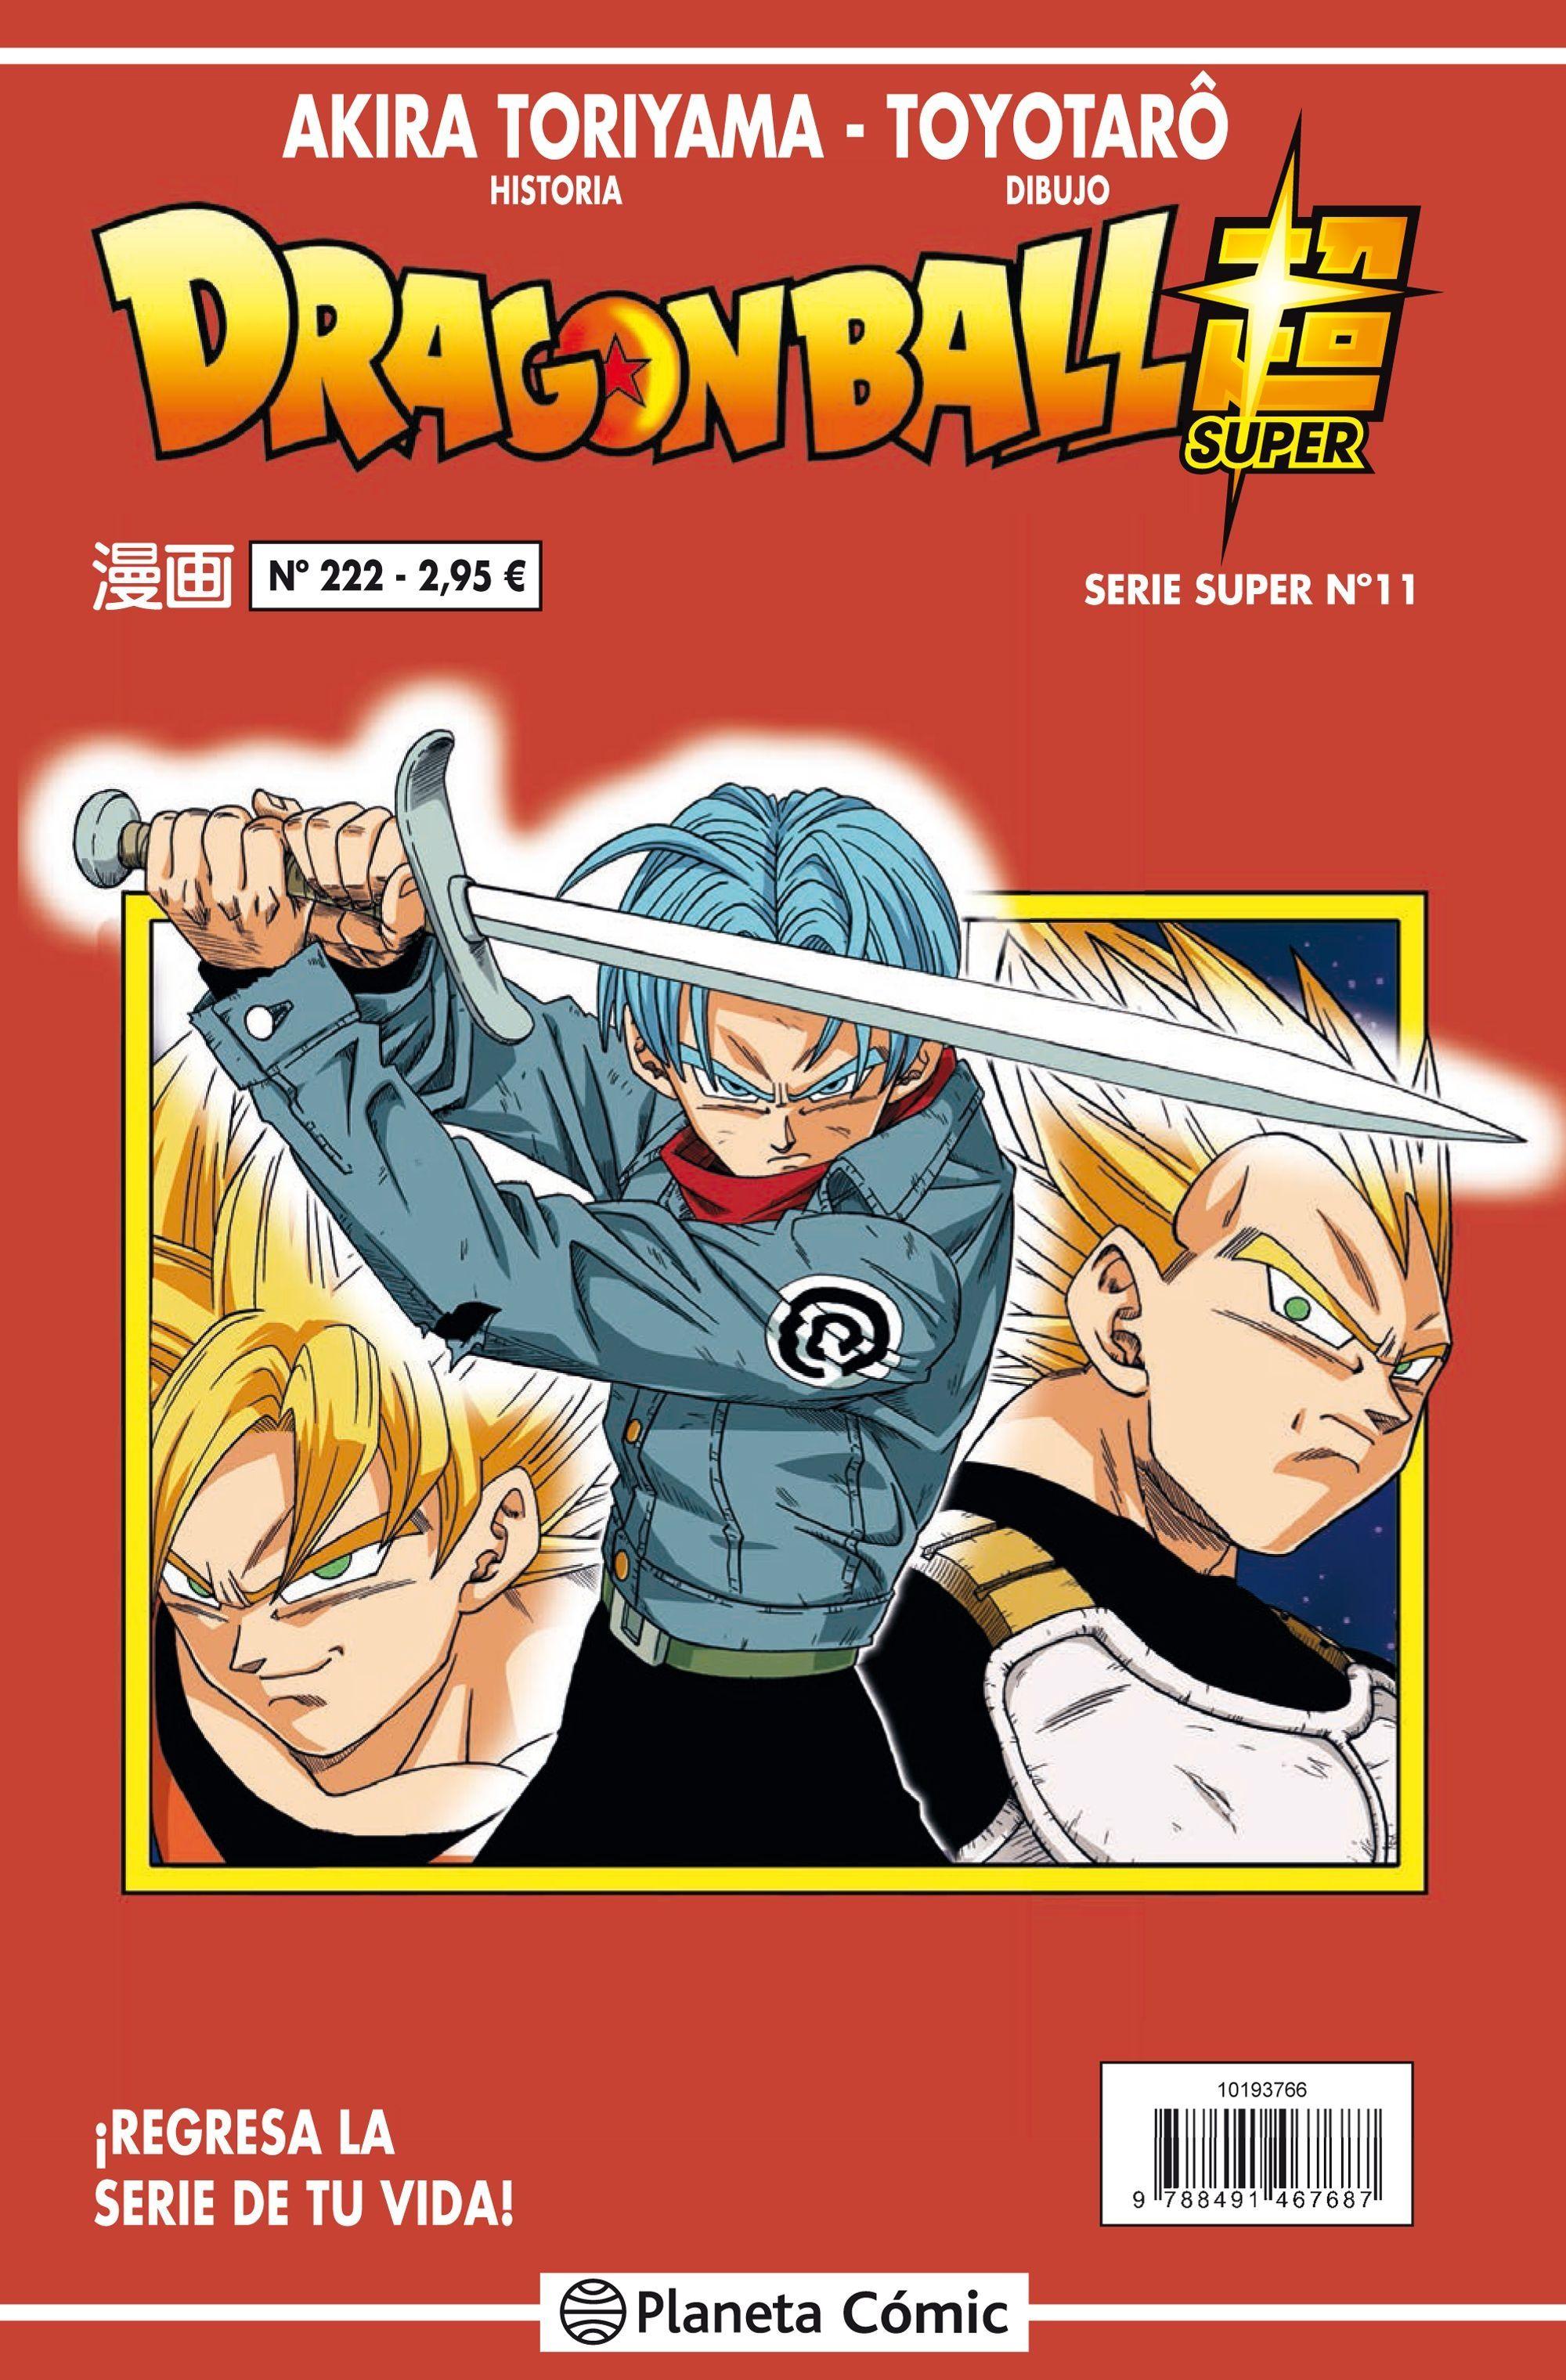 Dragon ball serie roja manga | Akira, Dragones y Manga